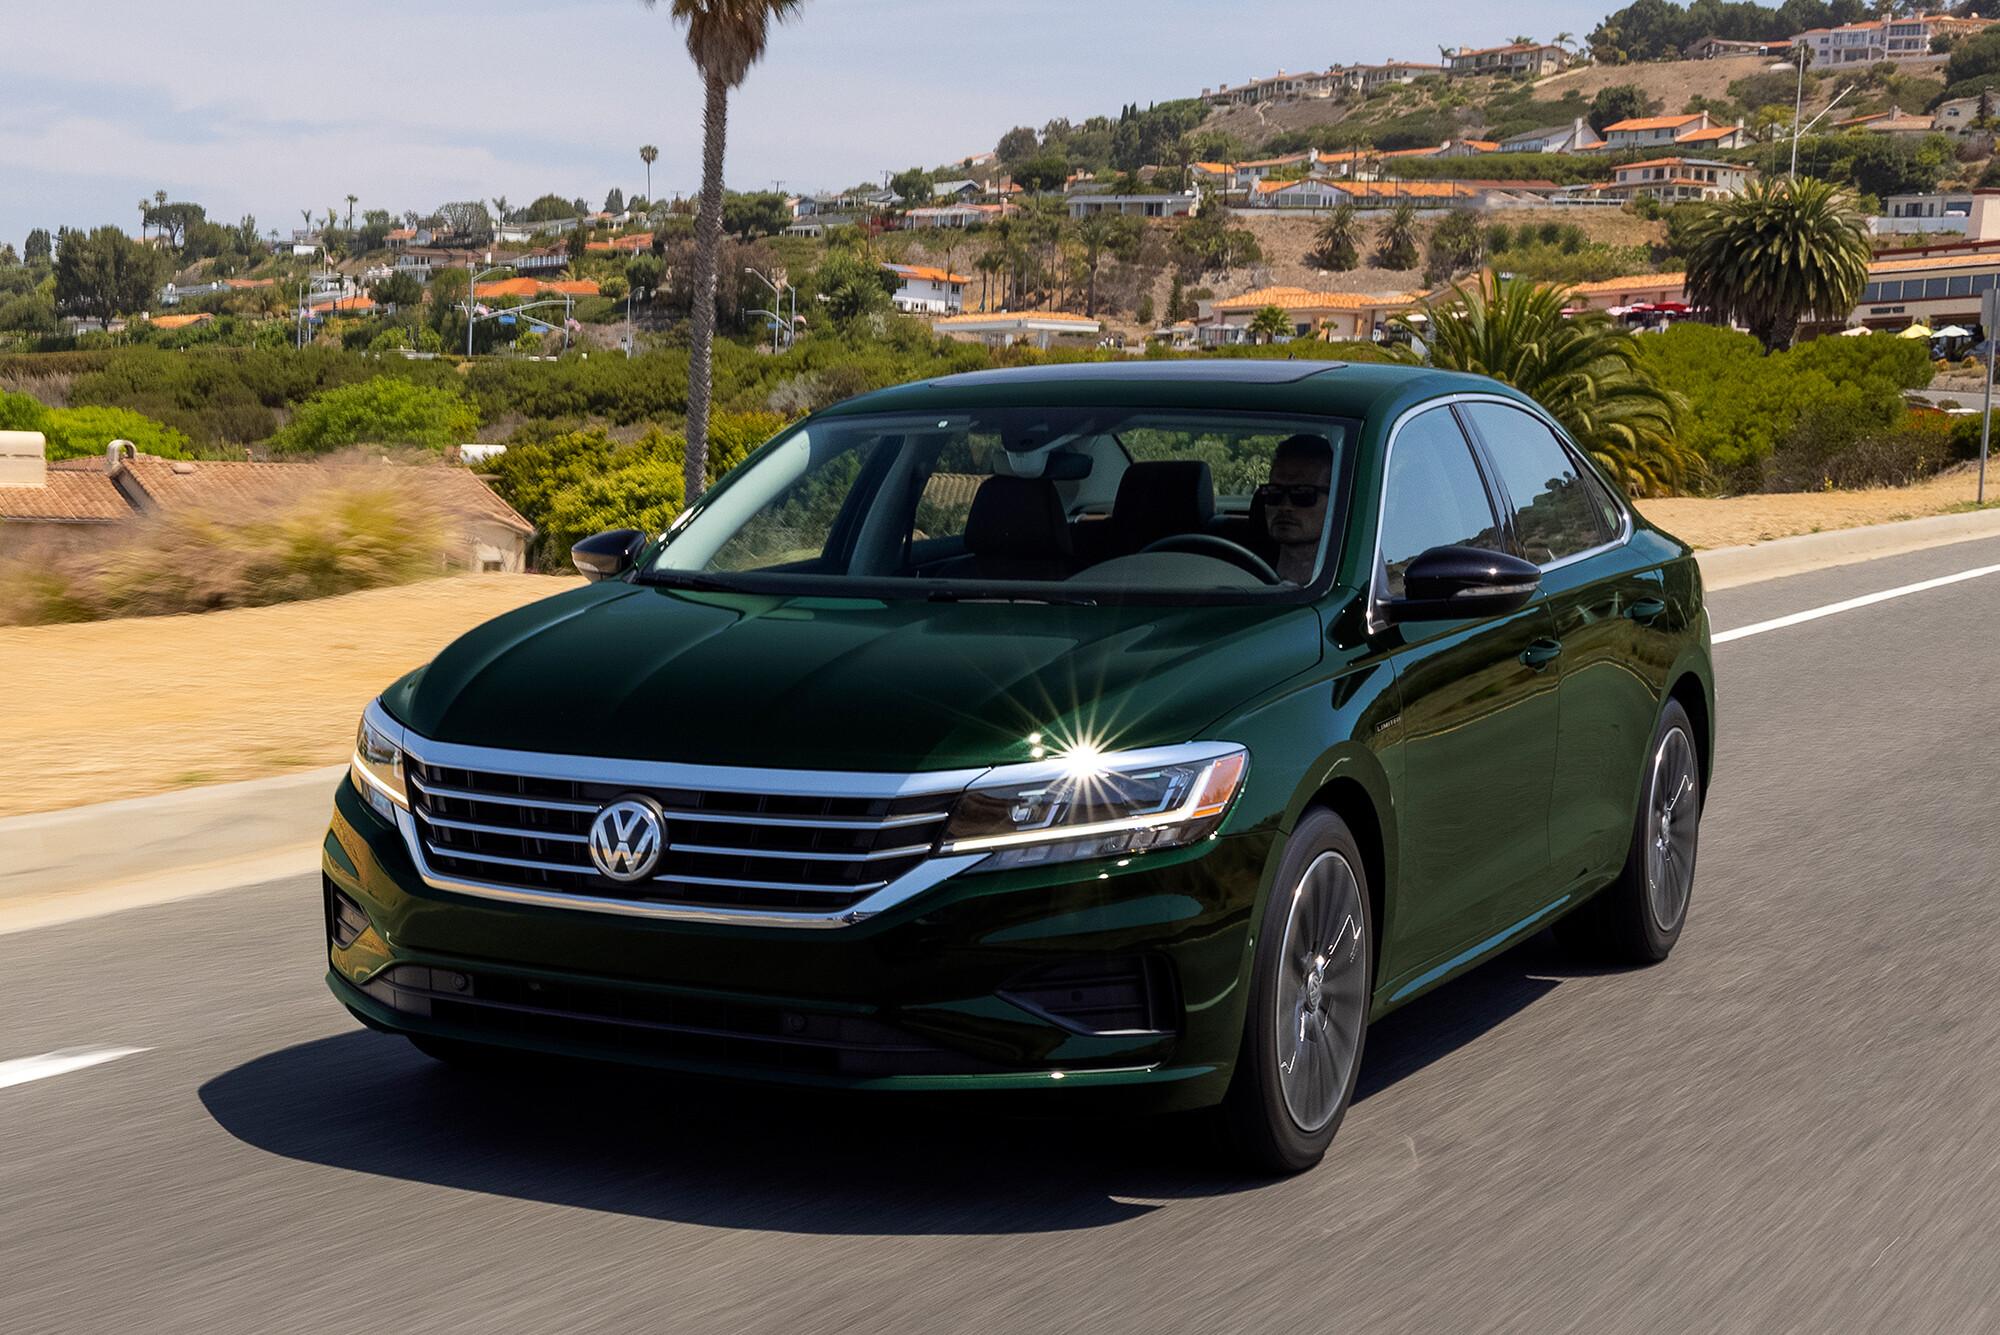 Foto de Volkswagen Passat Limited Edtion (5/10)